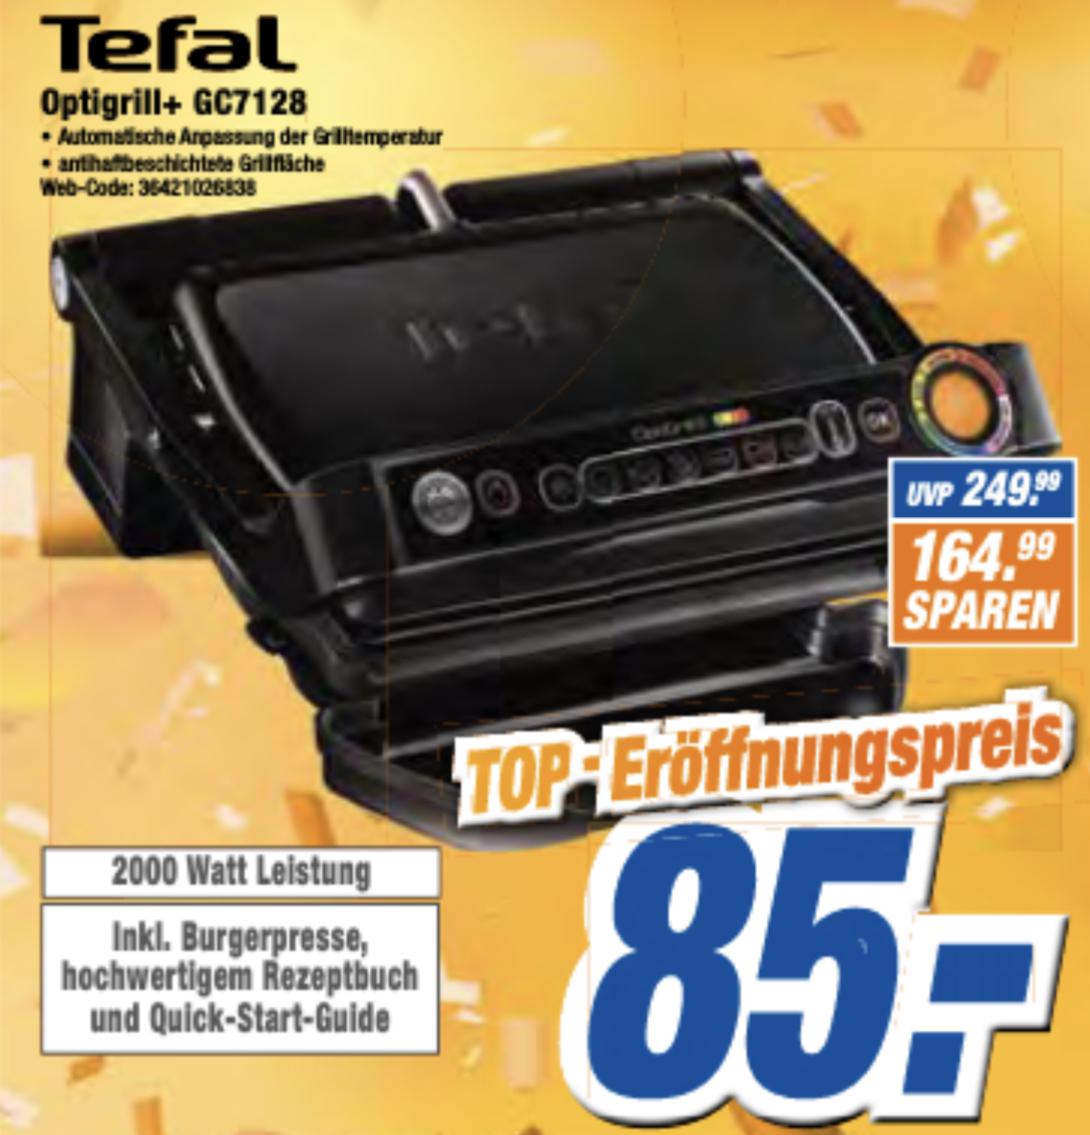 Expert Megaland: Tefal Optigrill+ GC7128 inkl. Burgerpresse für 85€